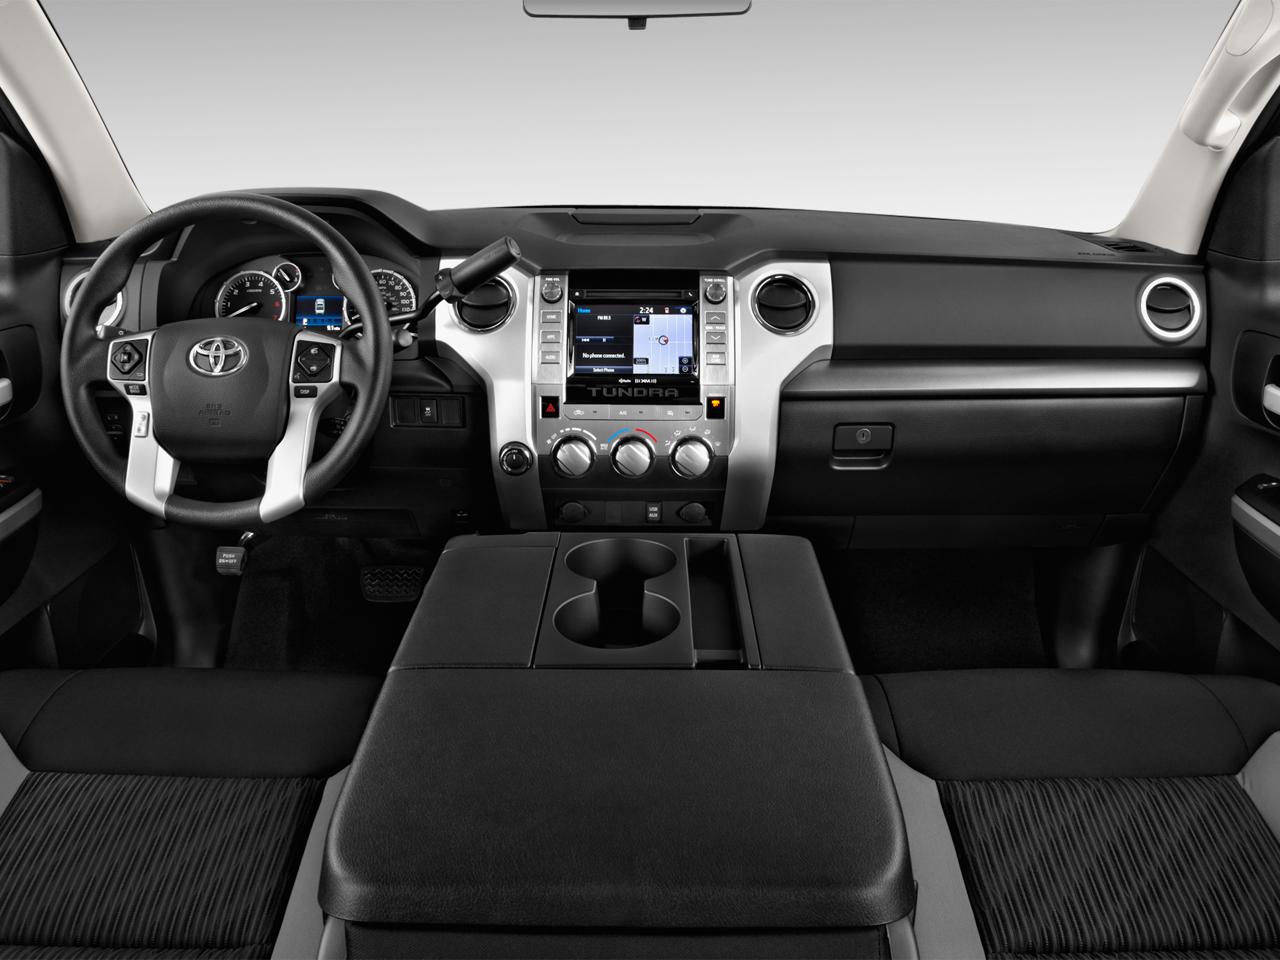 Best Tundra Toyota Interior With Tundra Toyota Interior